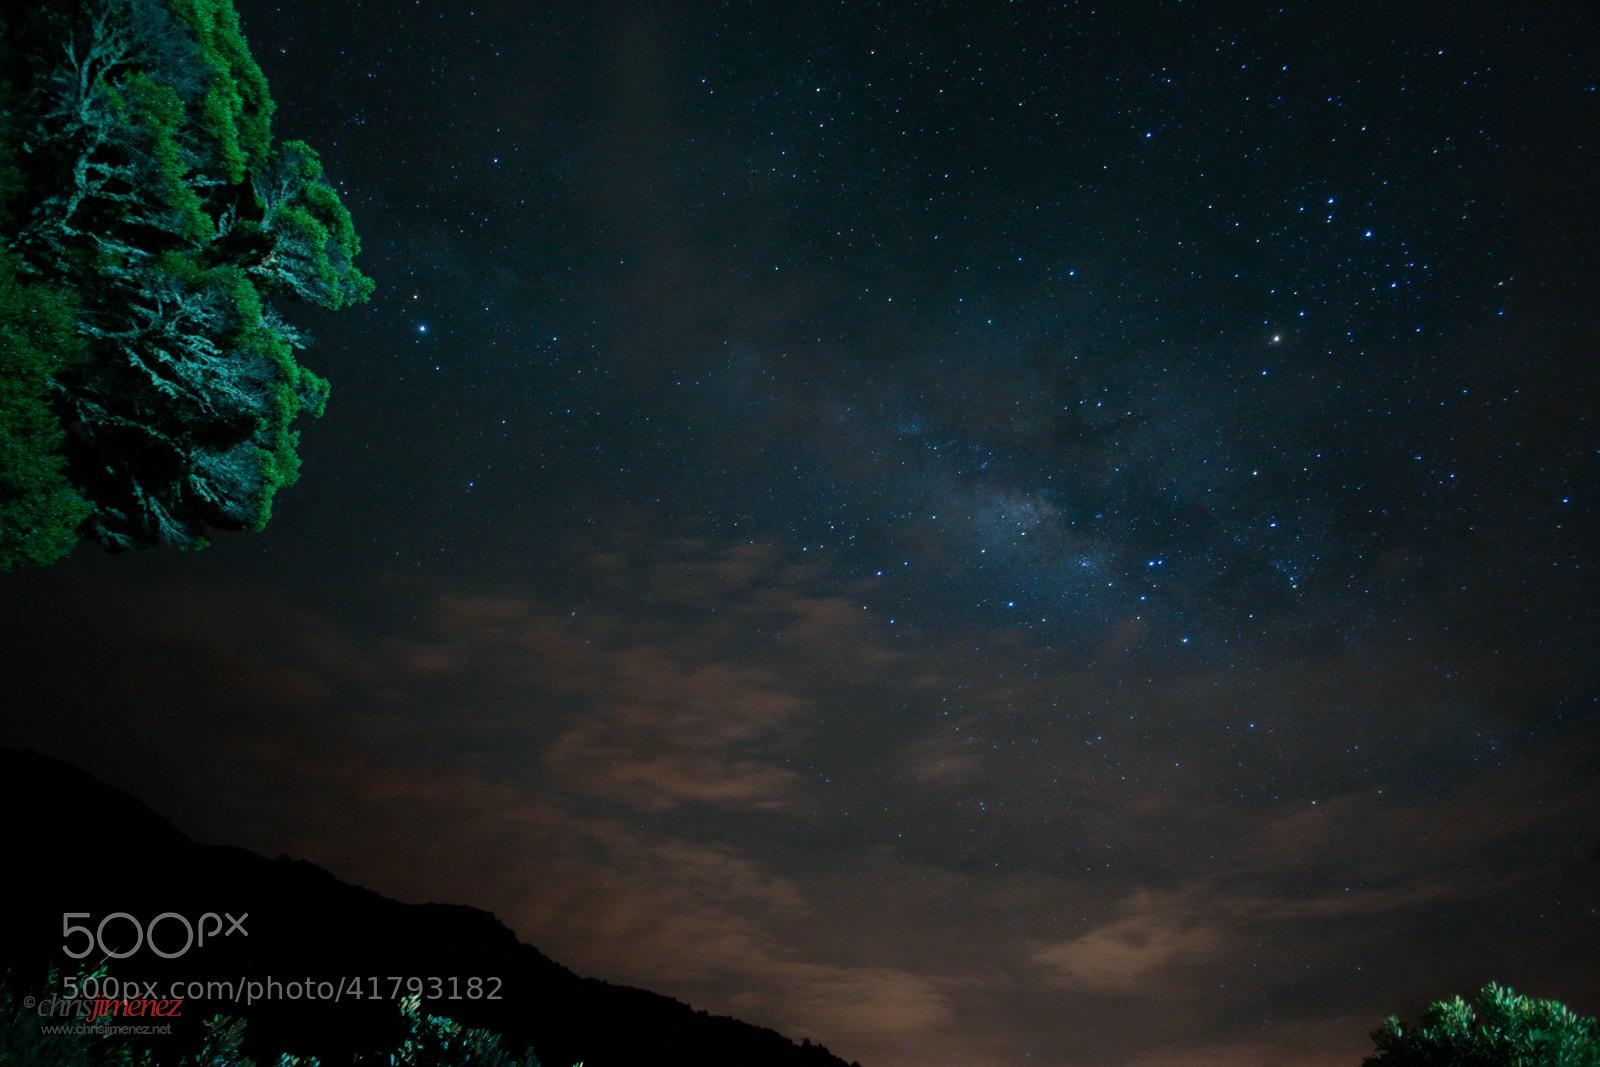 Photograph Starry Night by Chris Jimenez on 500px